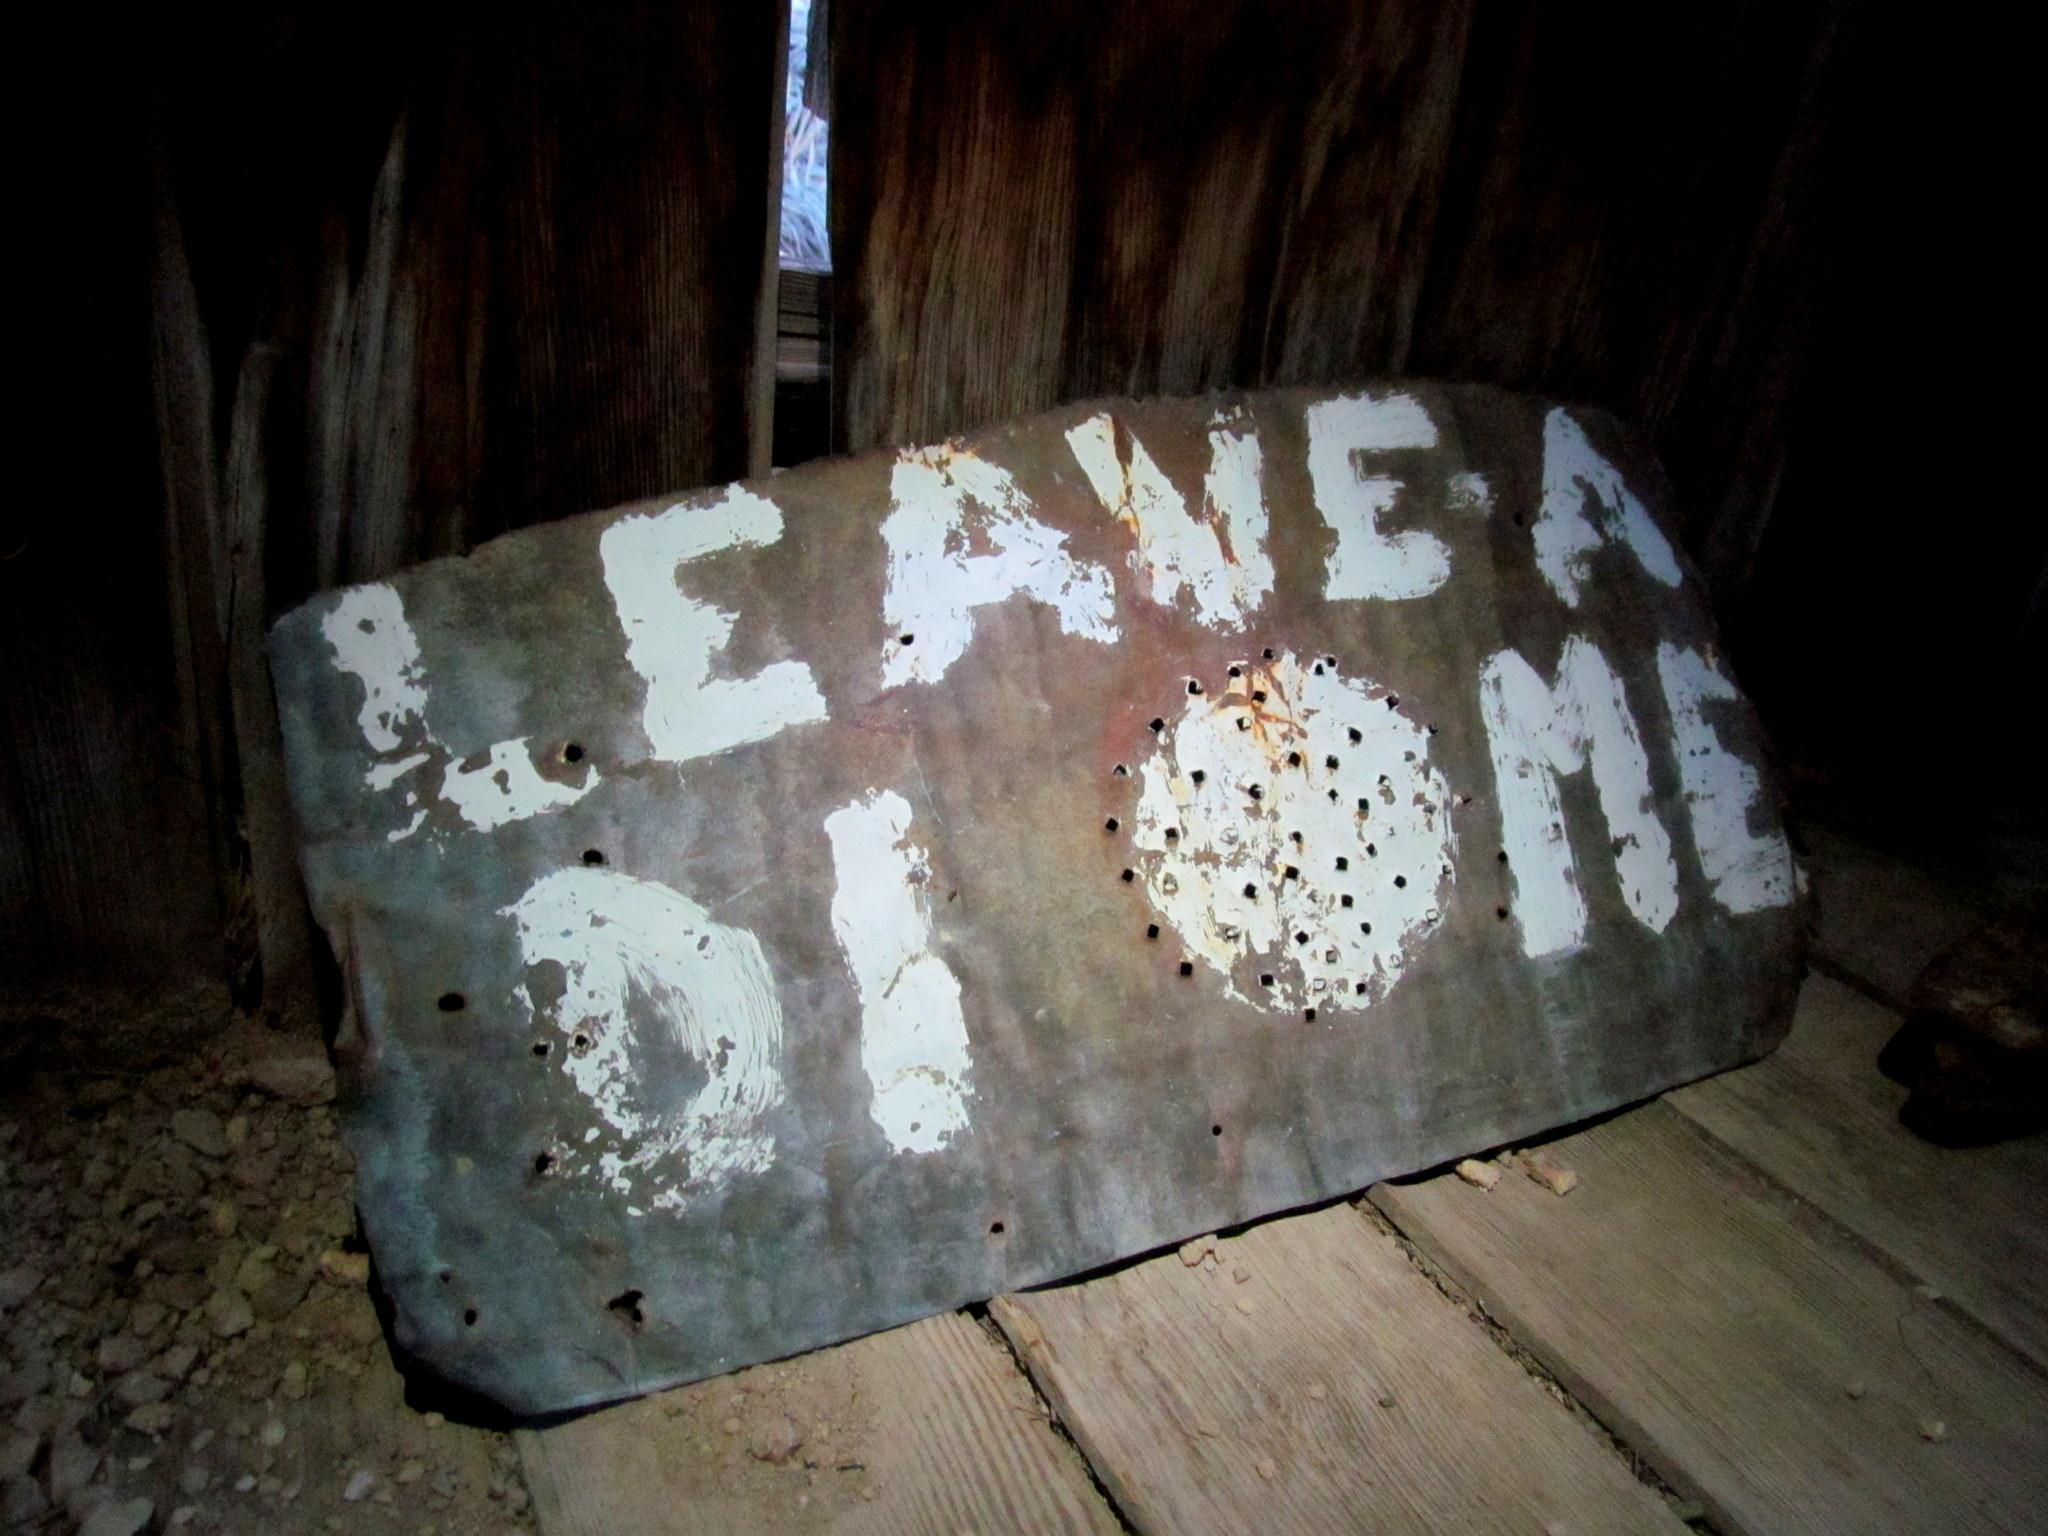 Photo: Leave a dime(?)